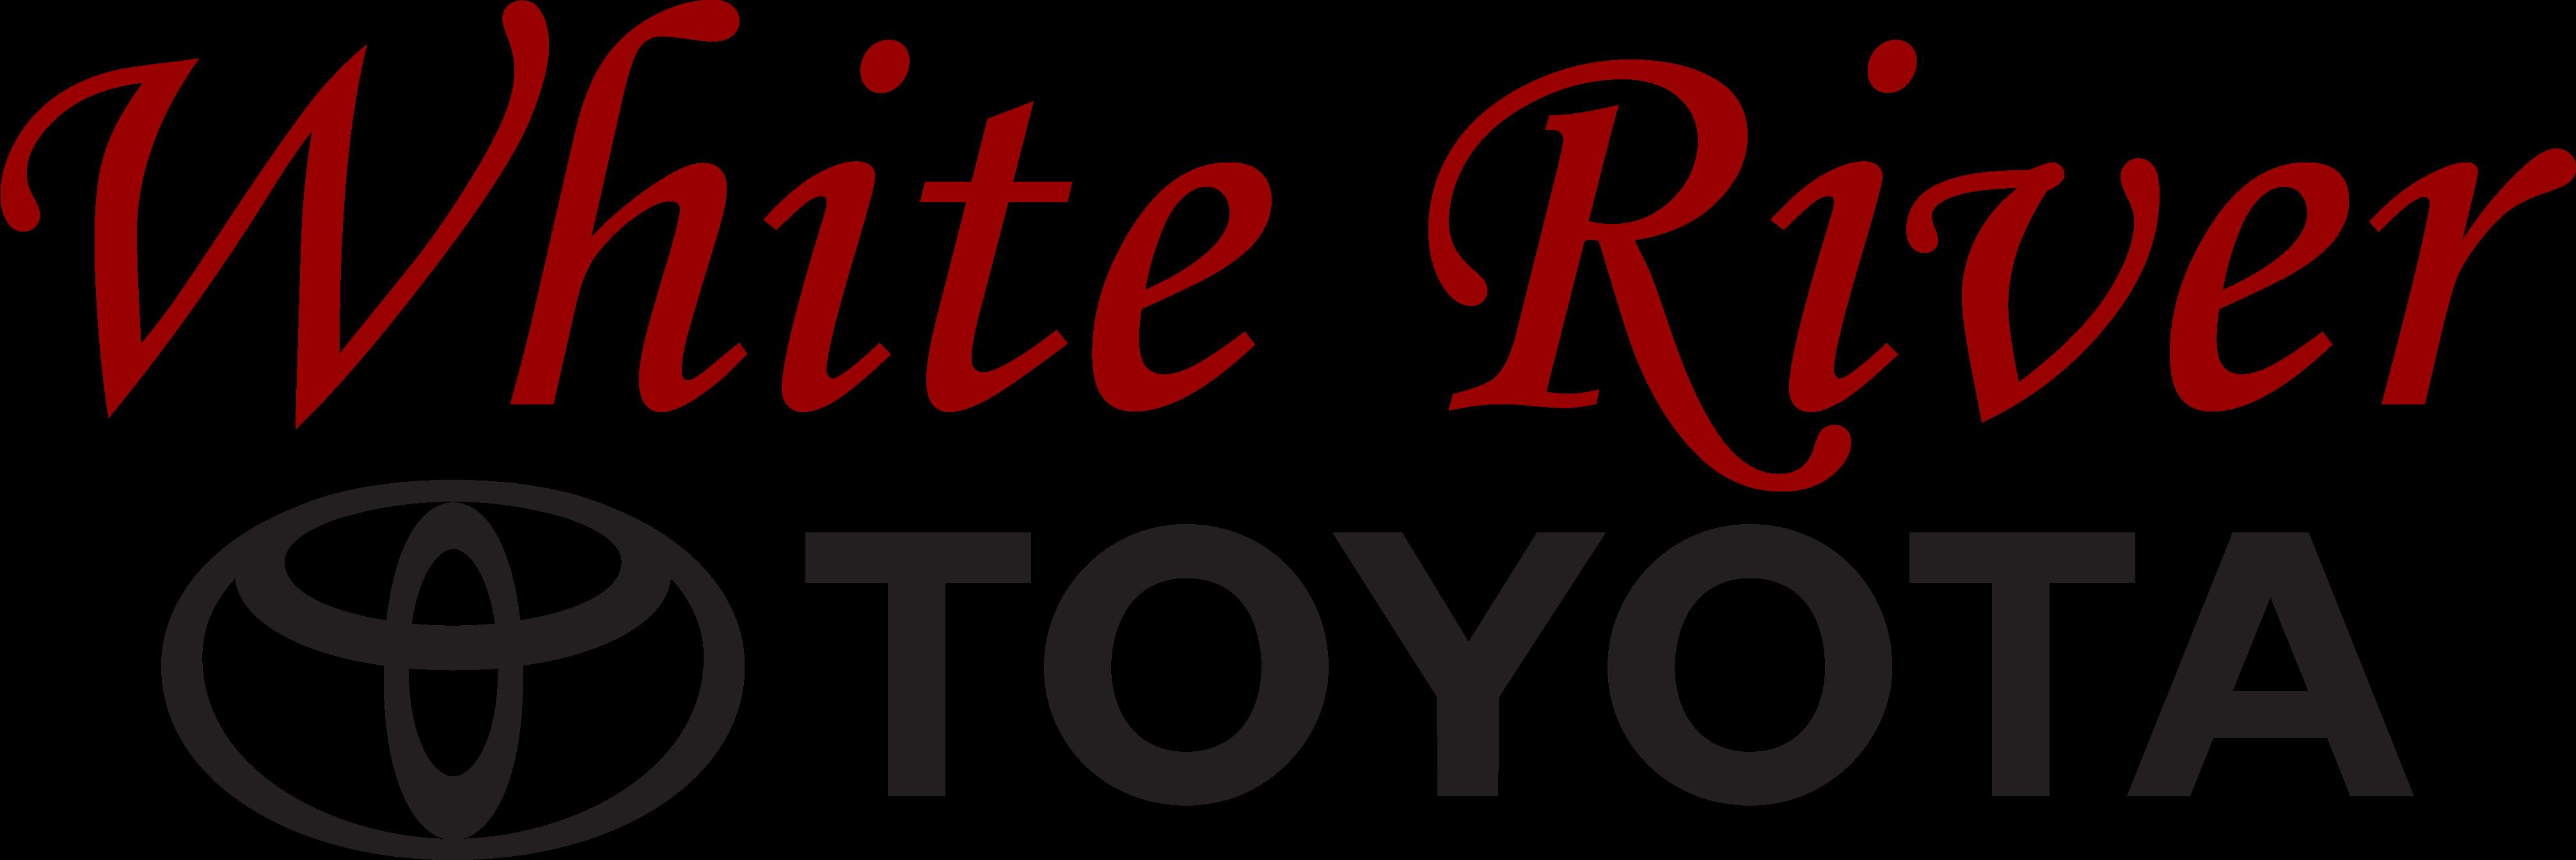 white_river_toyota_logo.png